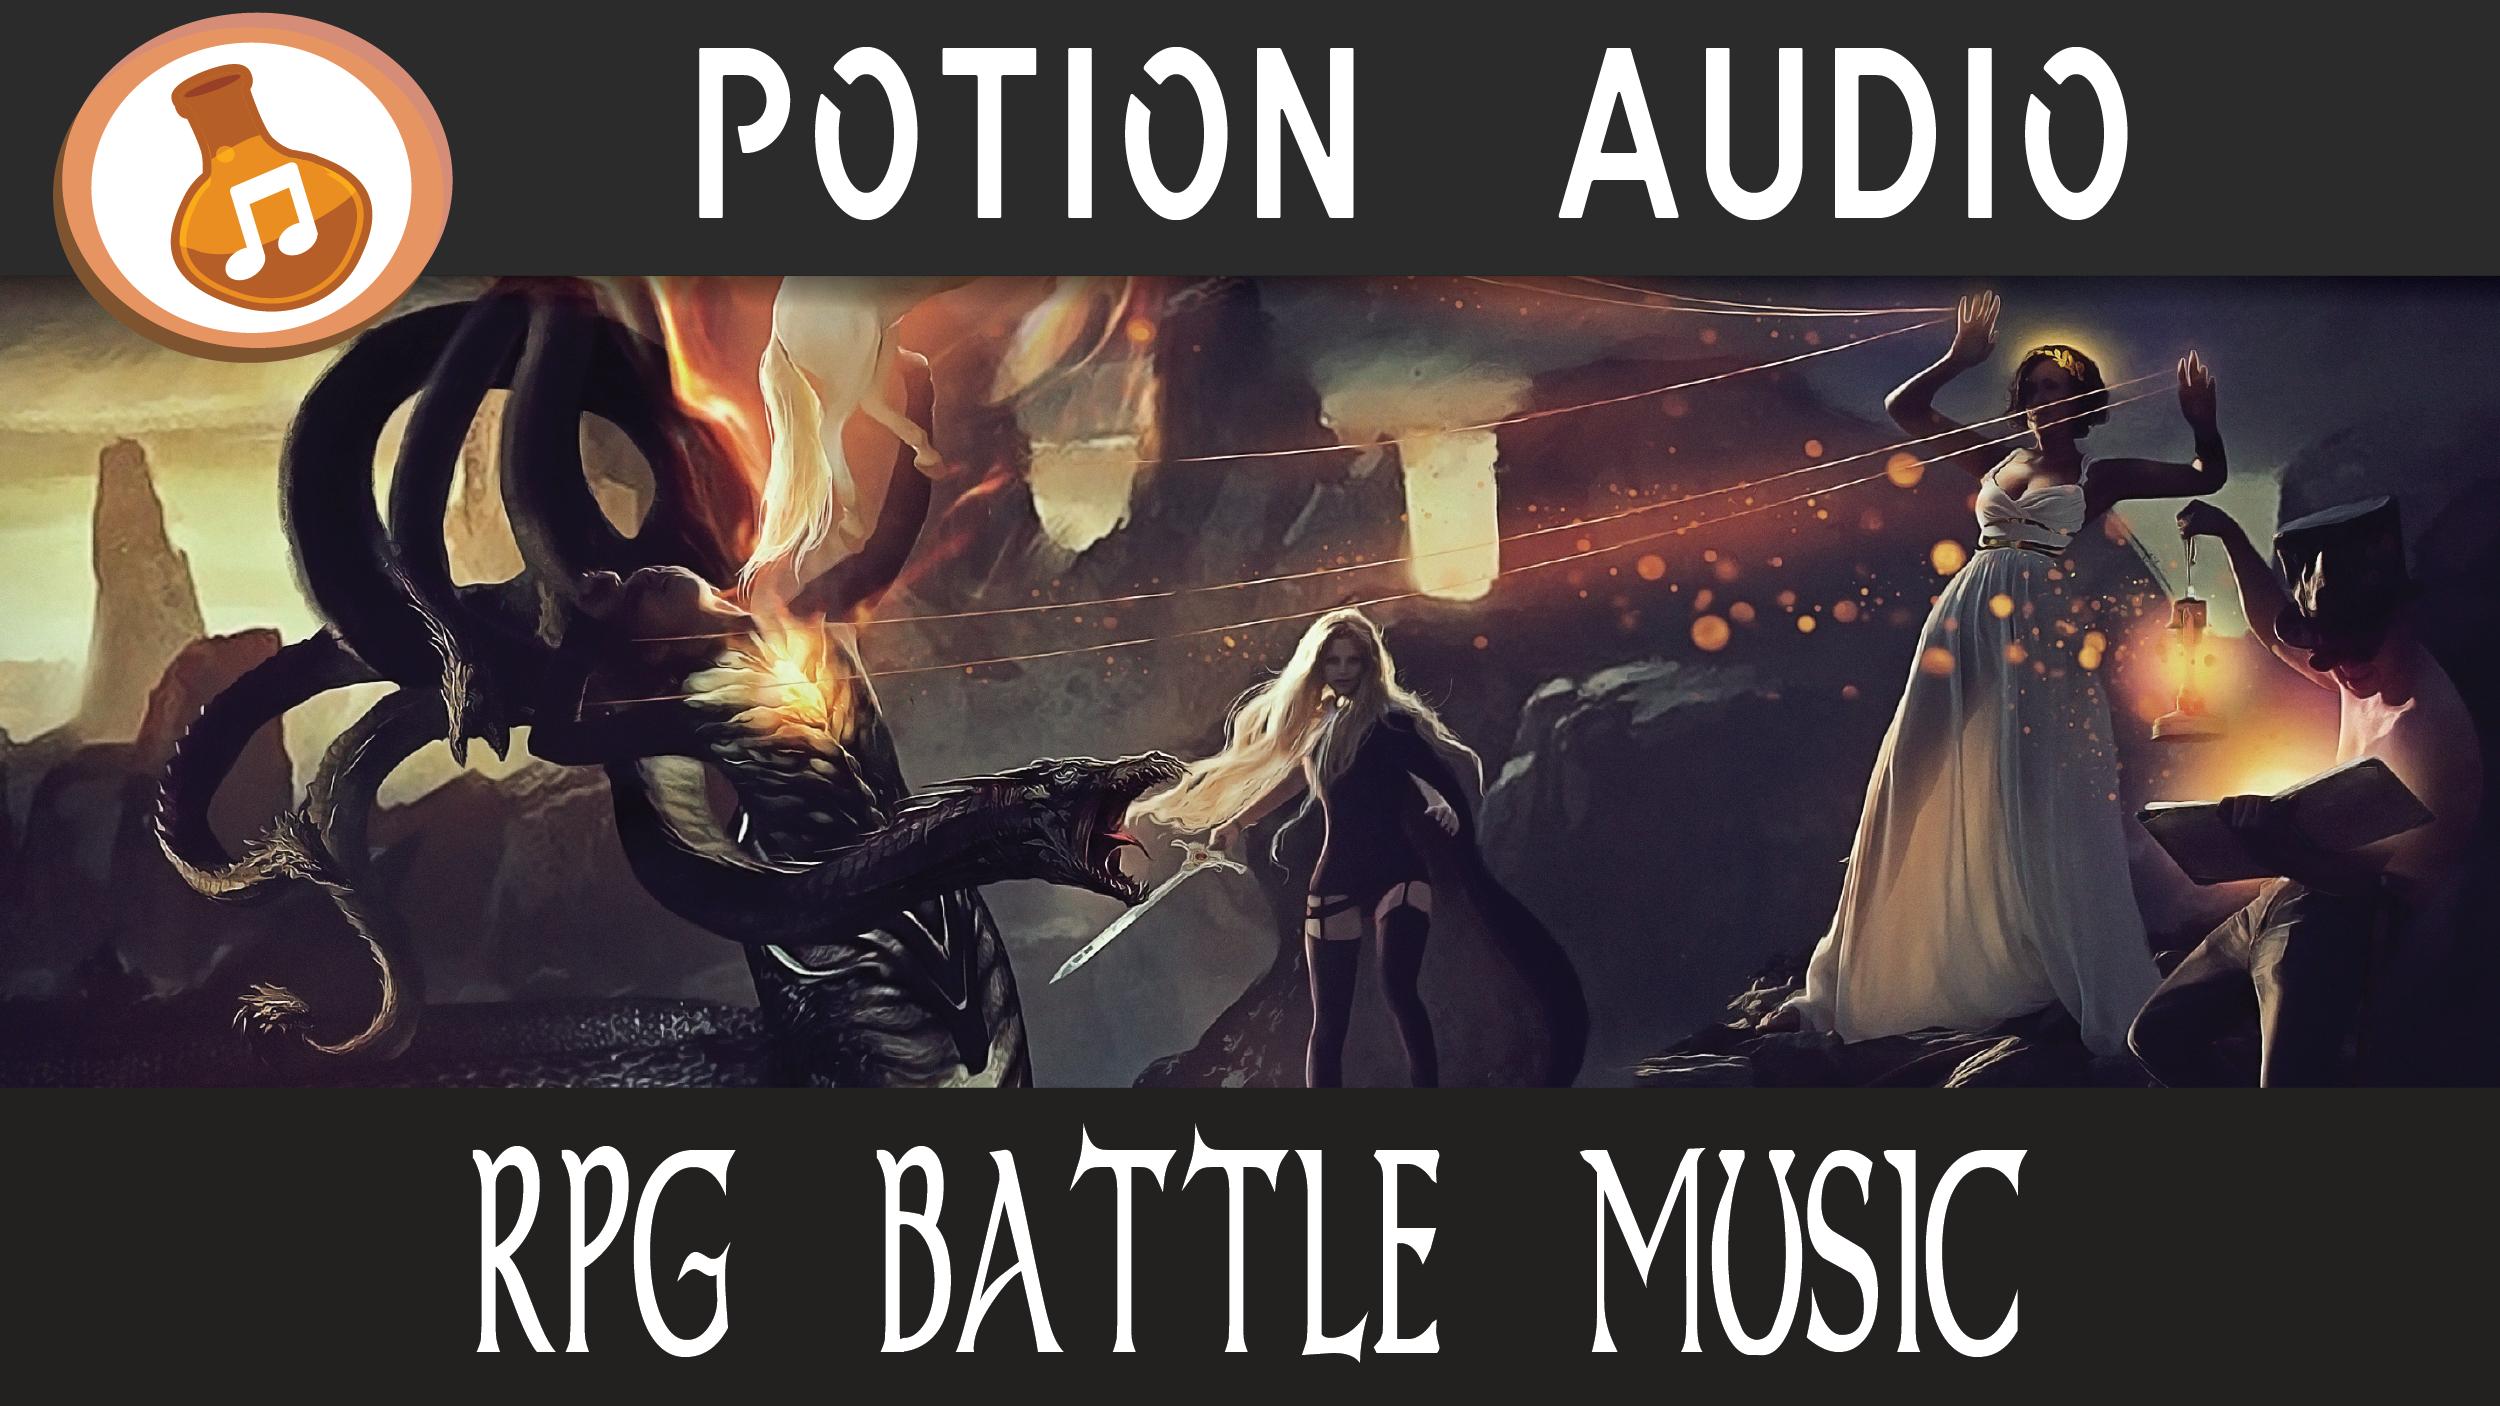 RPG Battle Themes Music